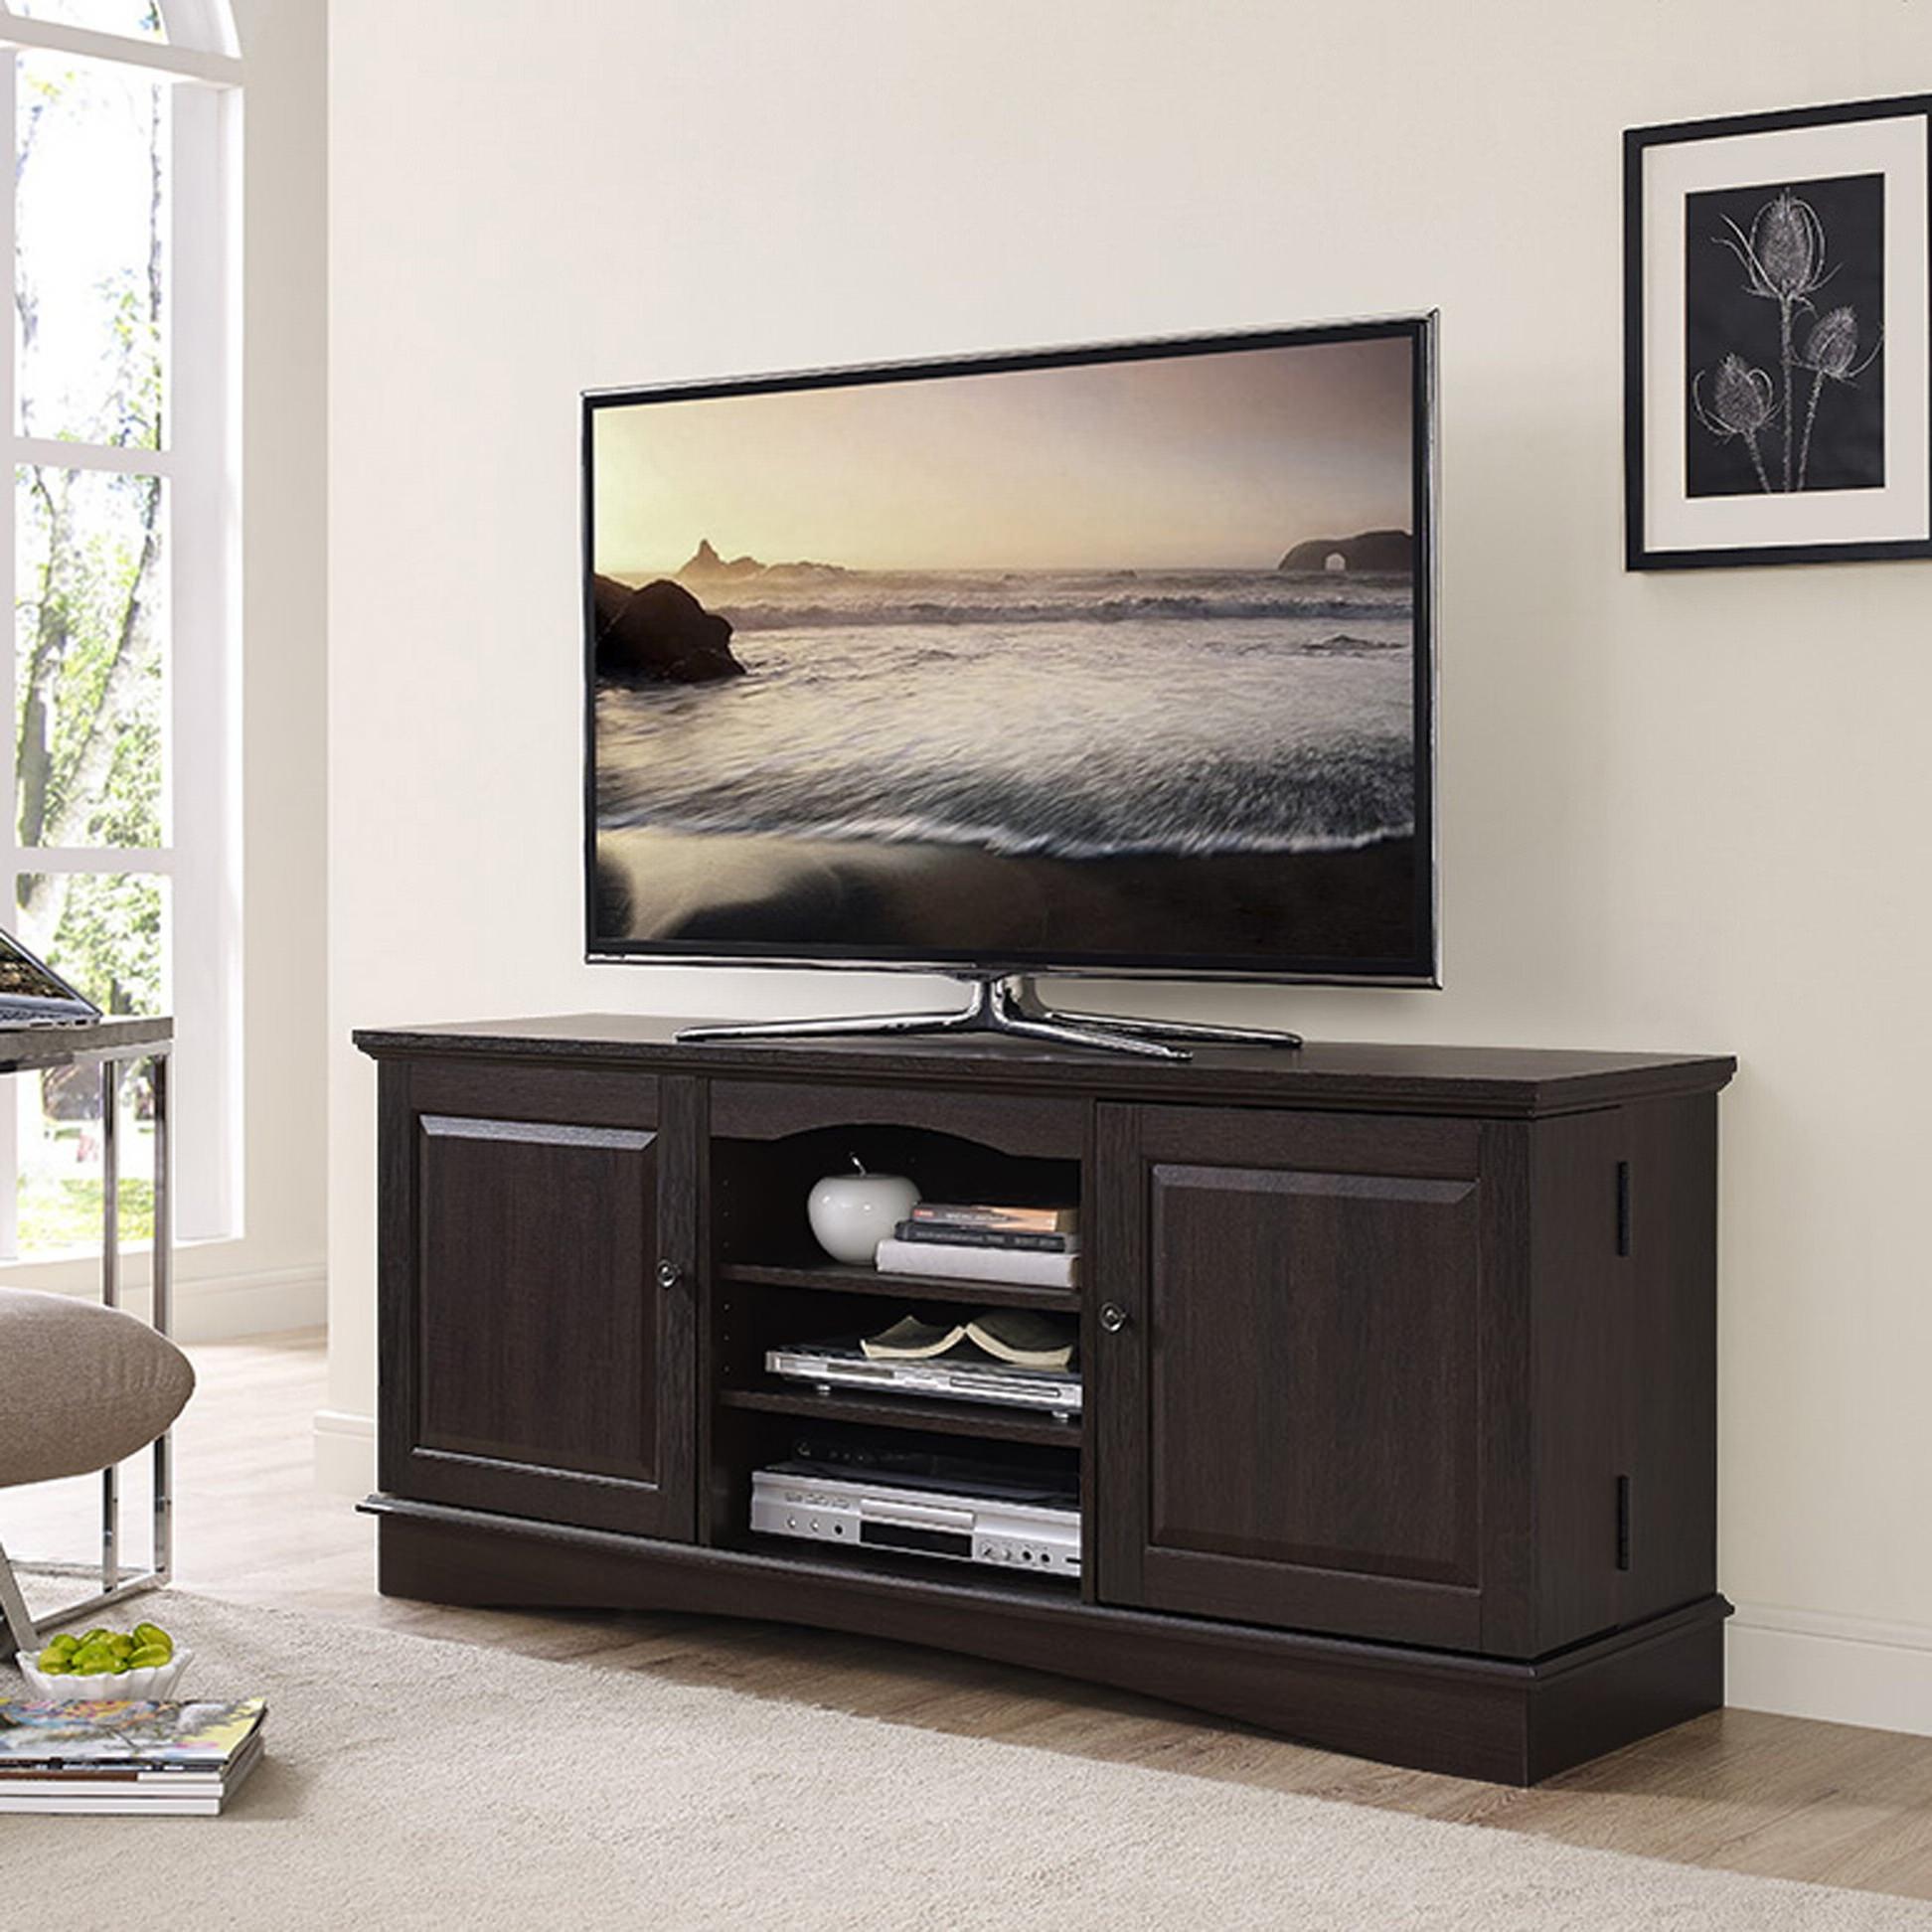 "60 Inch Espresso Wood Tv Standwalker Edison Inside Kasen Tv Stands For Tvs Up To 60"" (View 5 of 20)"